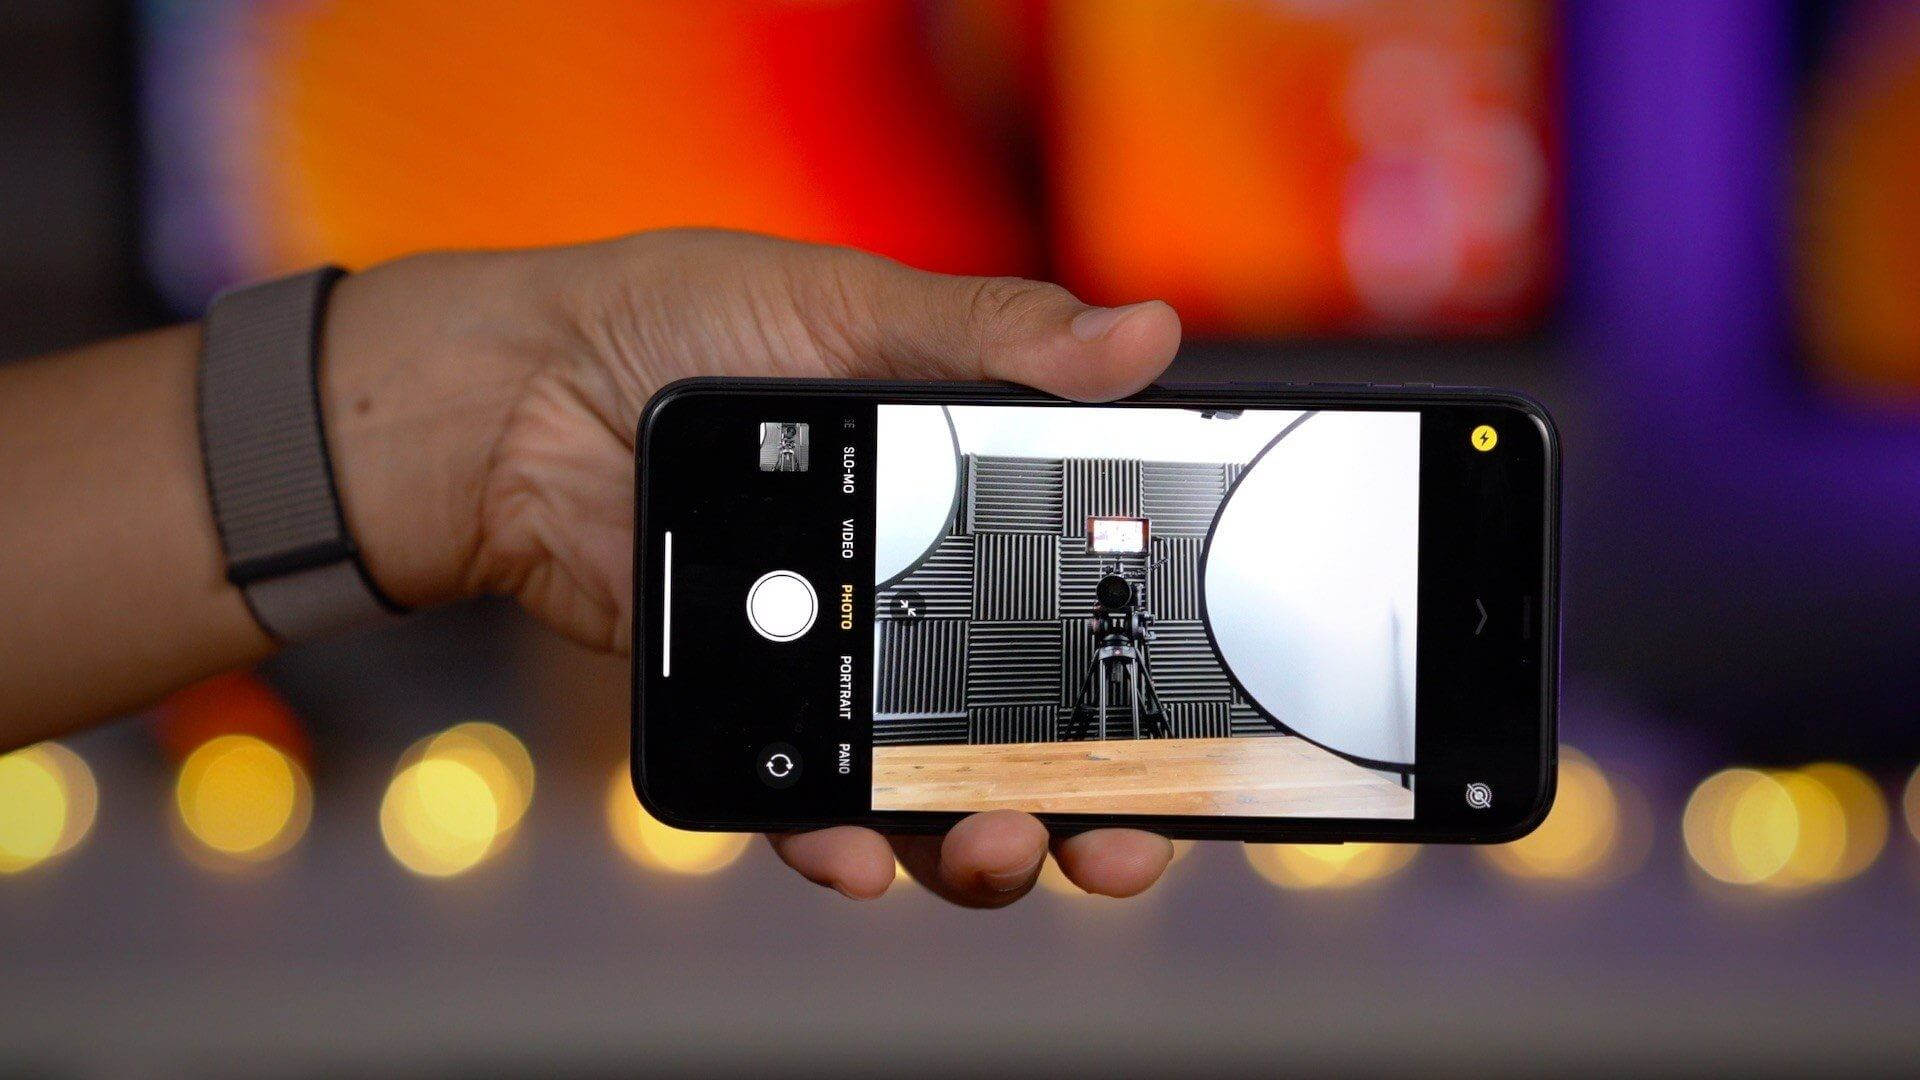 iPhone 11 Pro Max入選《消費者報告》最佳